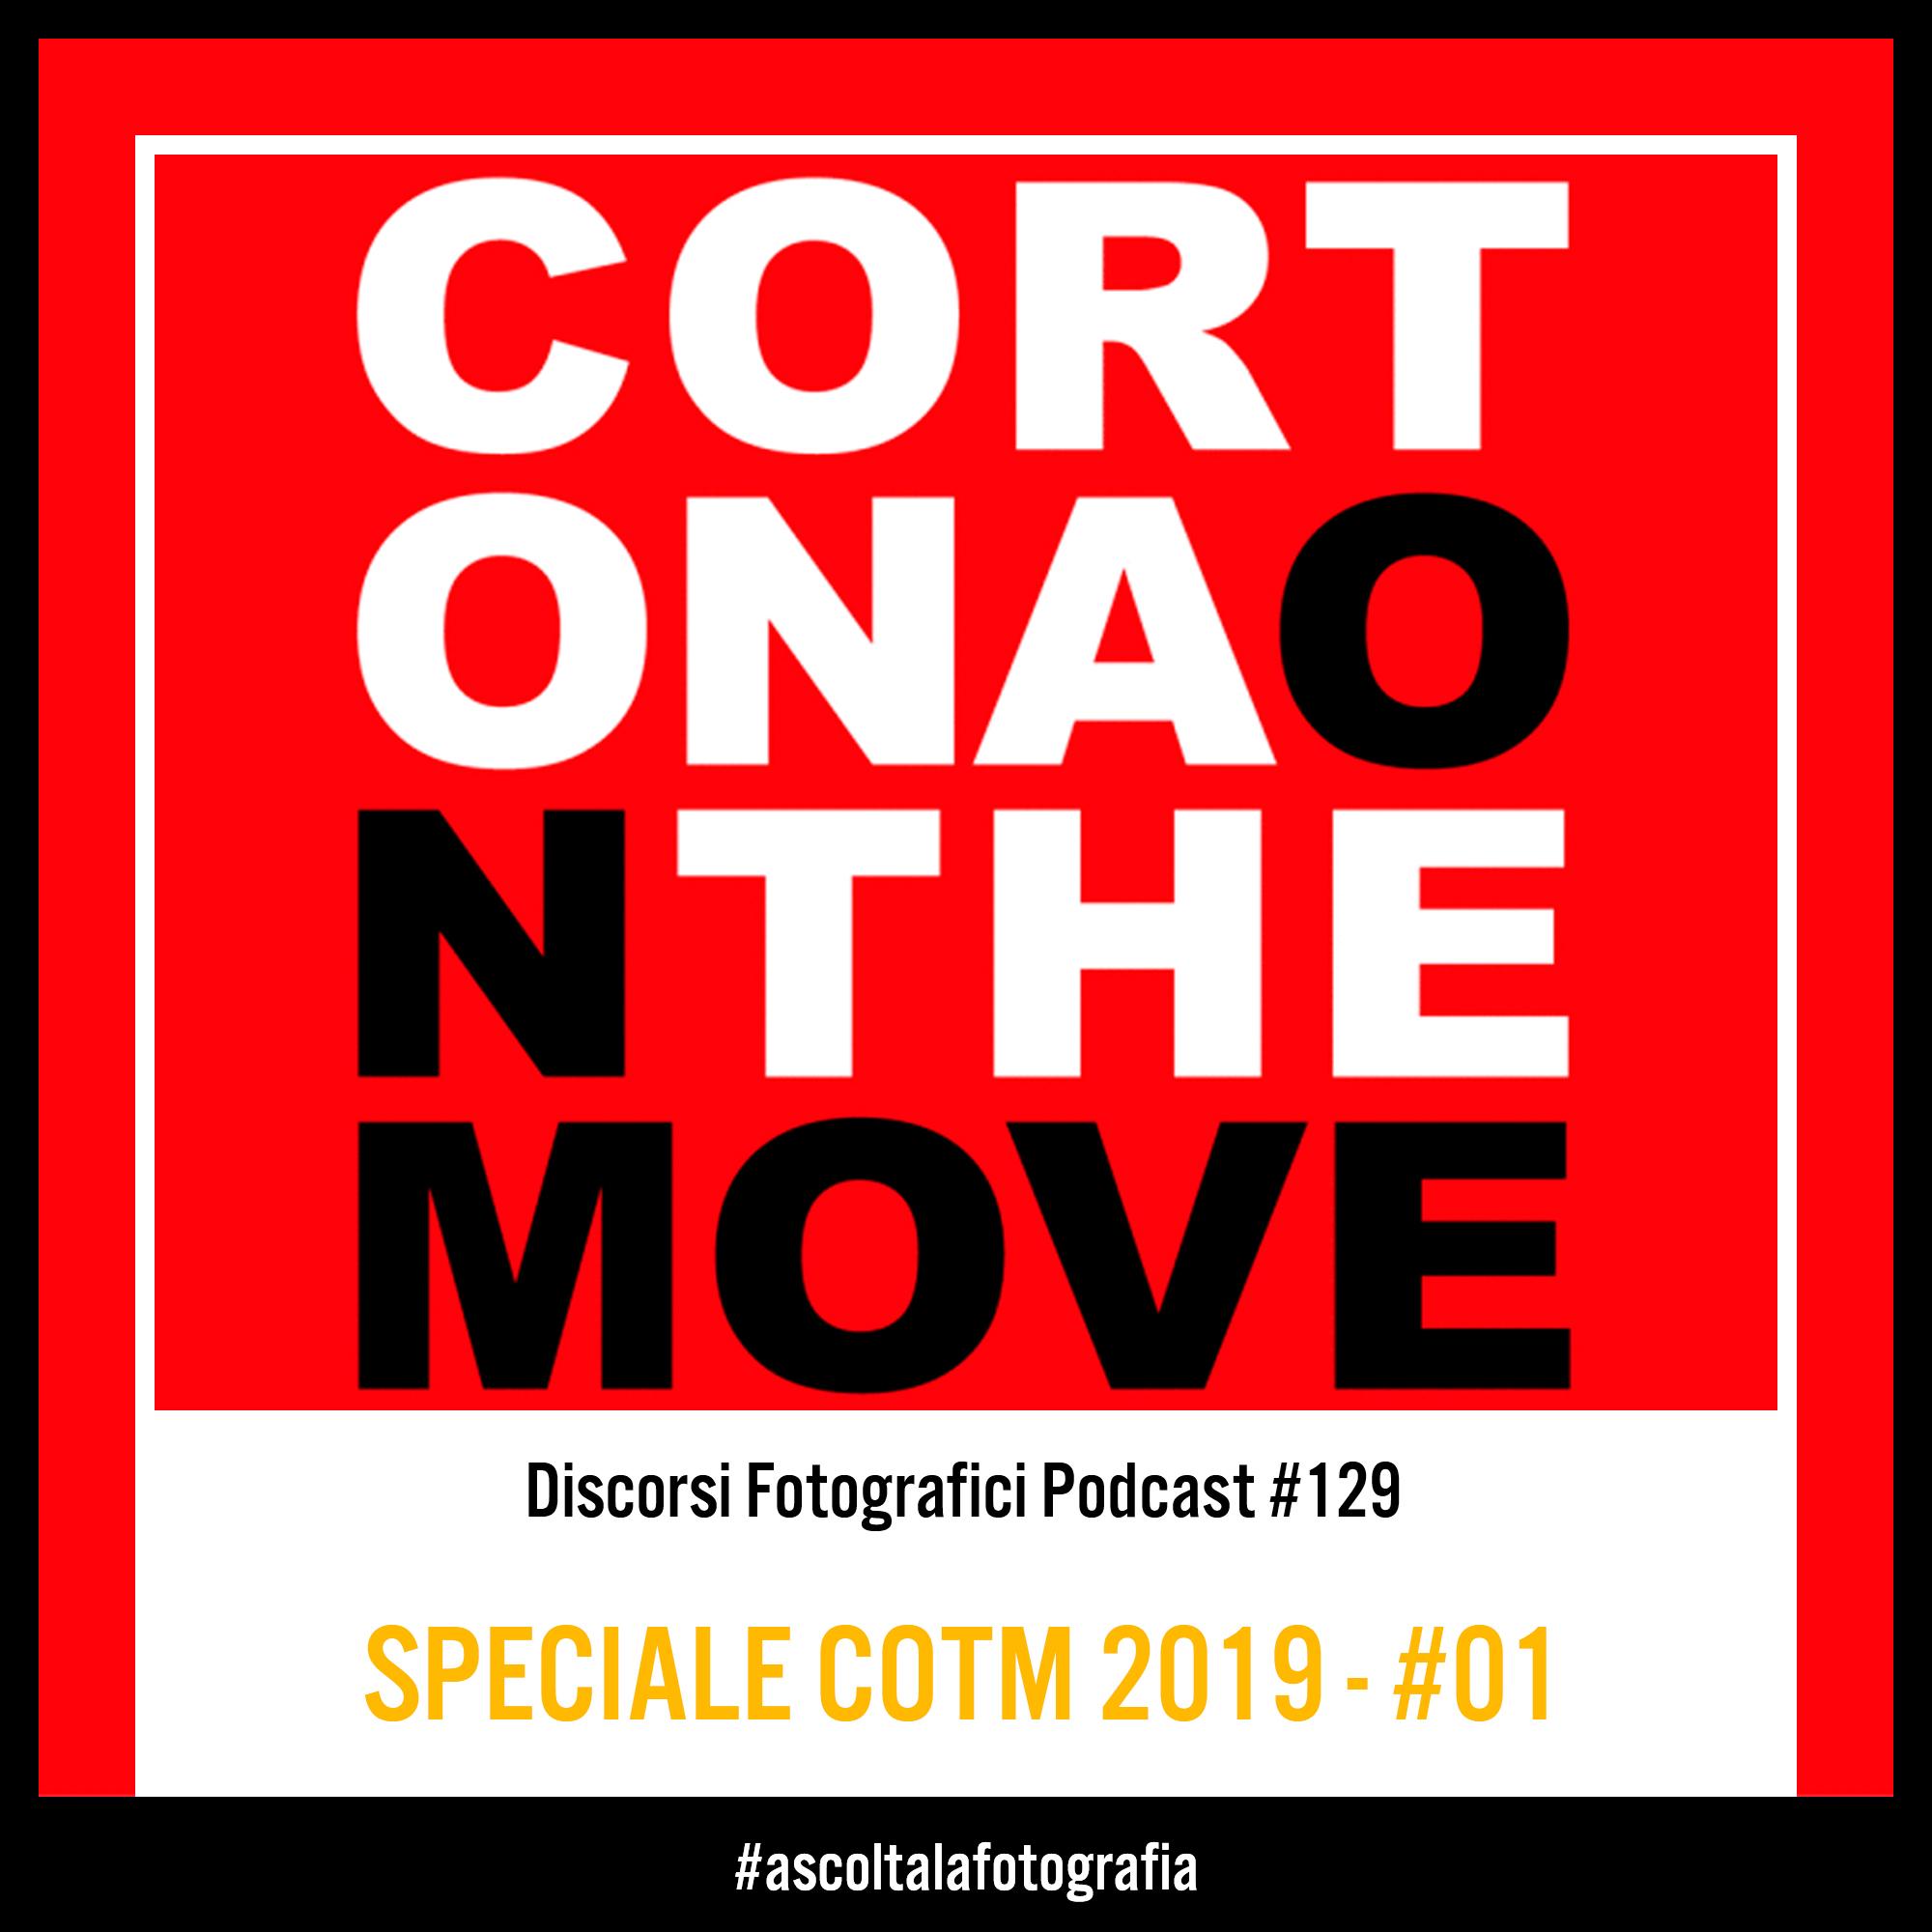 SPECIALE COTM 2019-#01